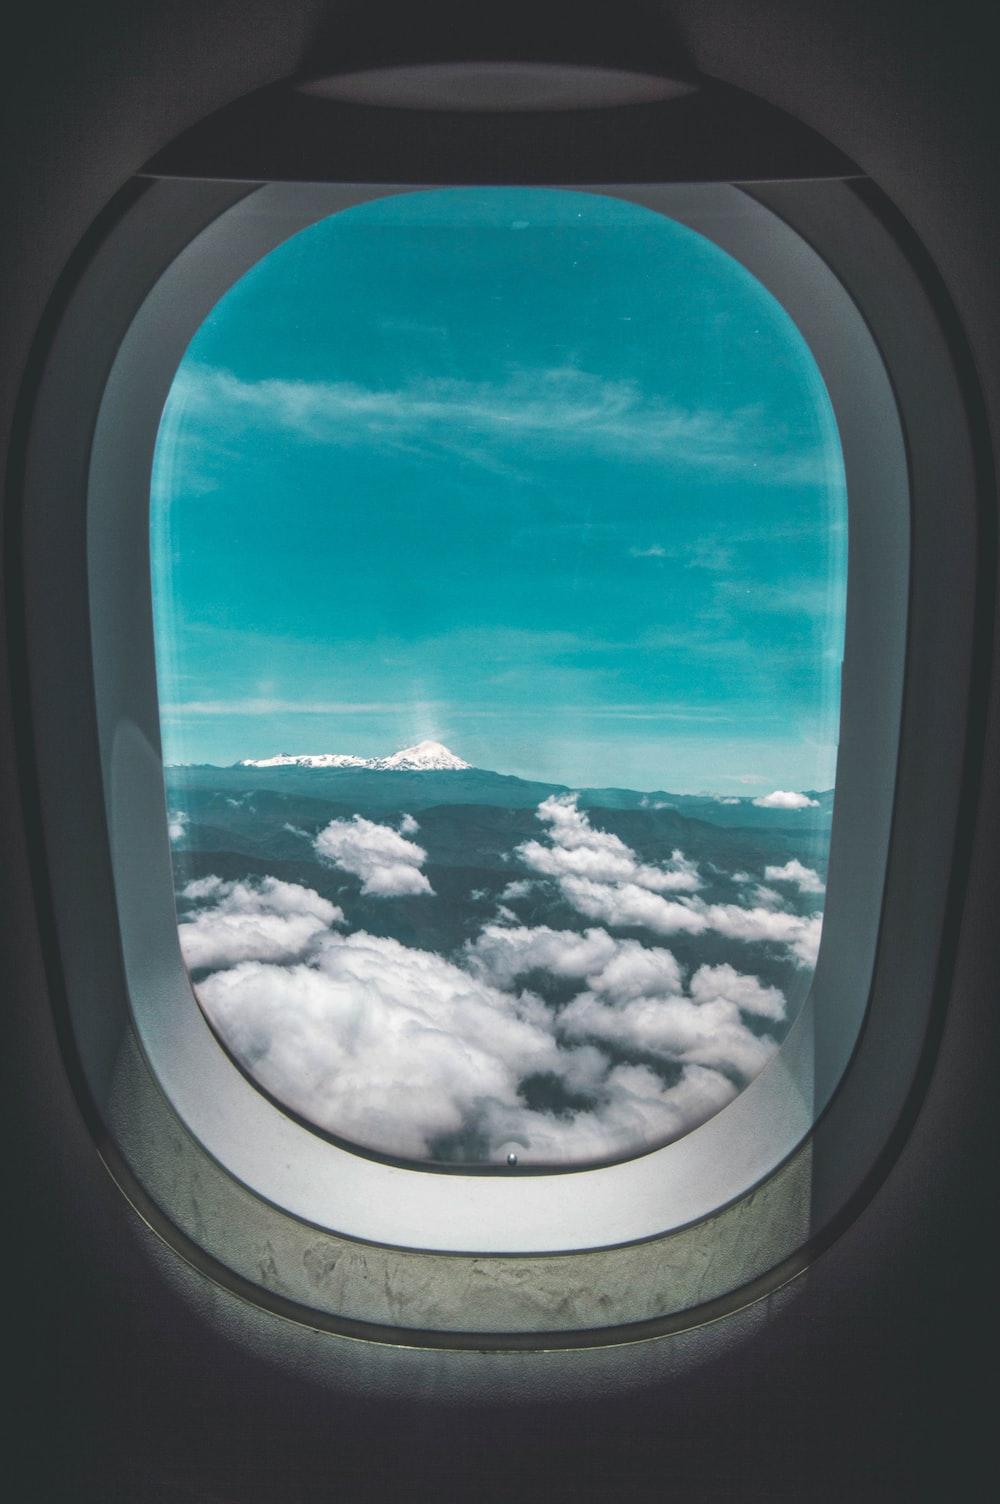 airplane inside window at night